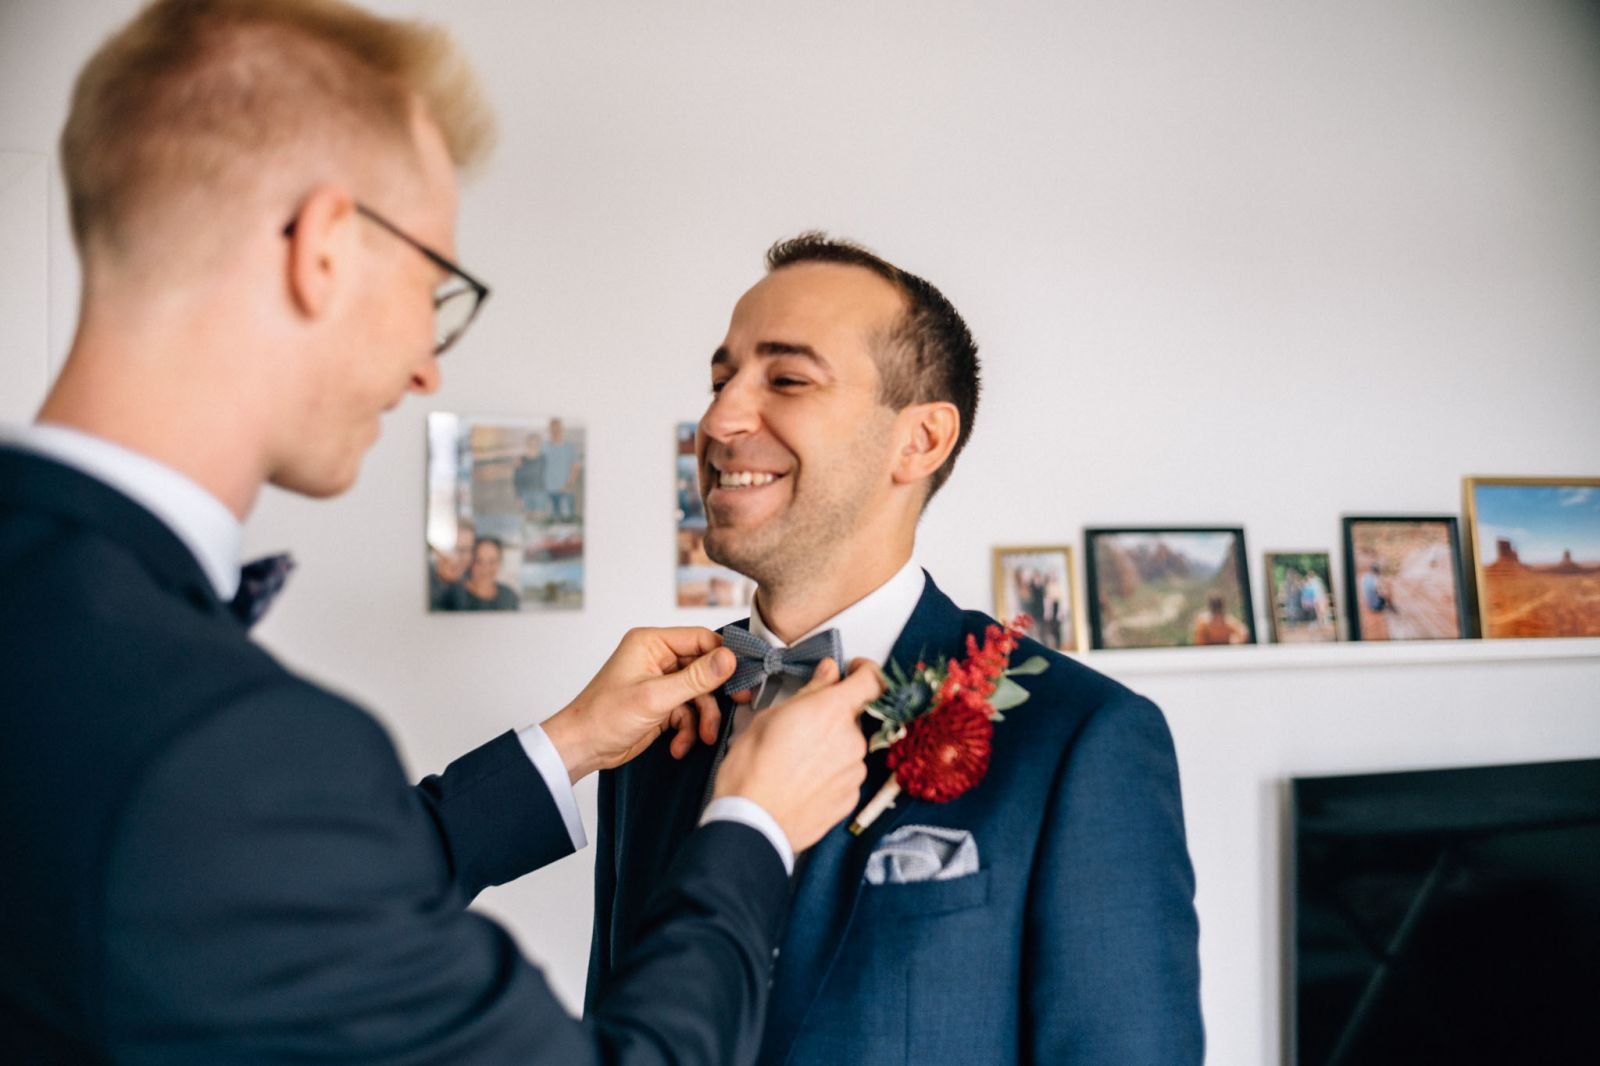 Hochzeitsfotograf OWL, Hochzeitsfotograf Bielefeld, Hochzeitsfotograf Lippe, Maik Molkentin-Grote